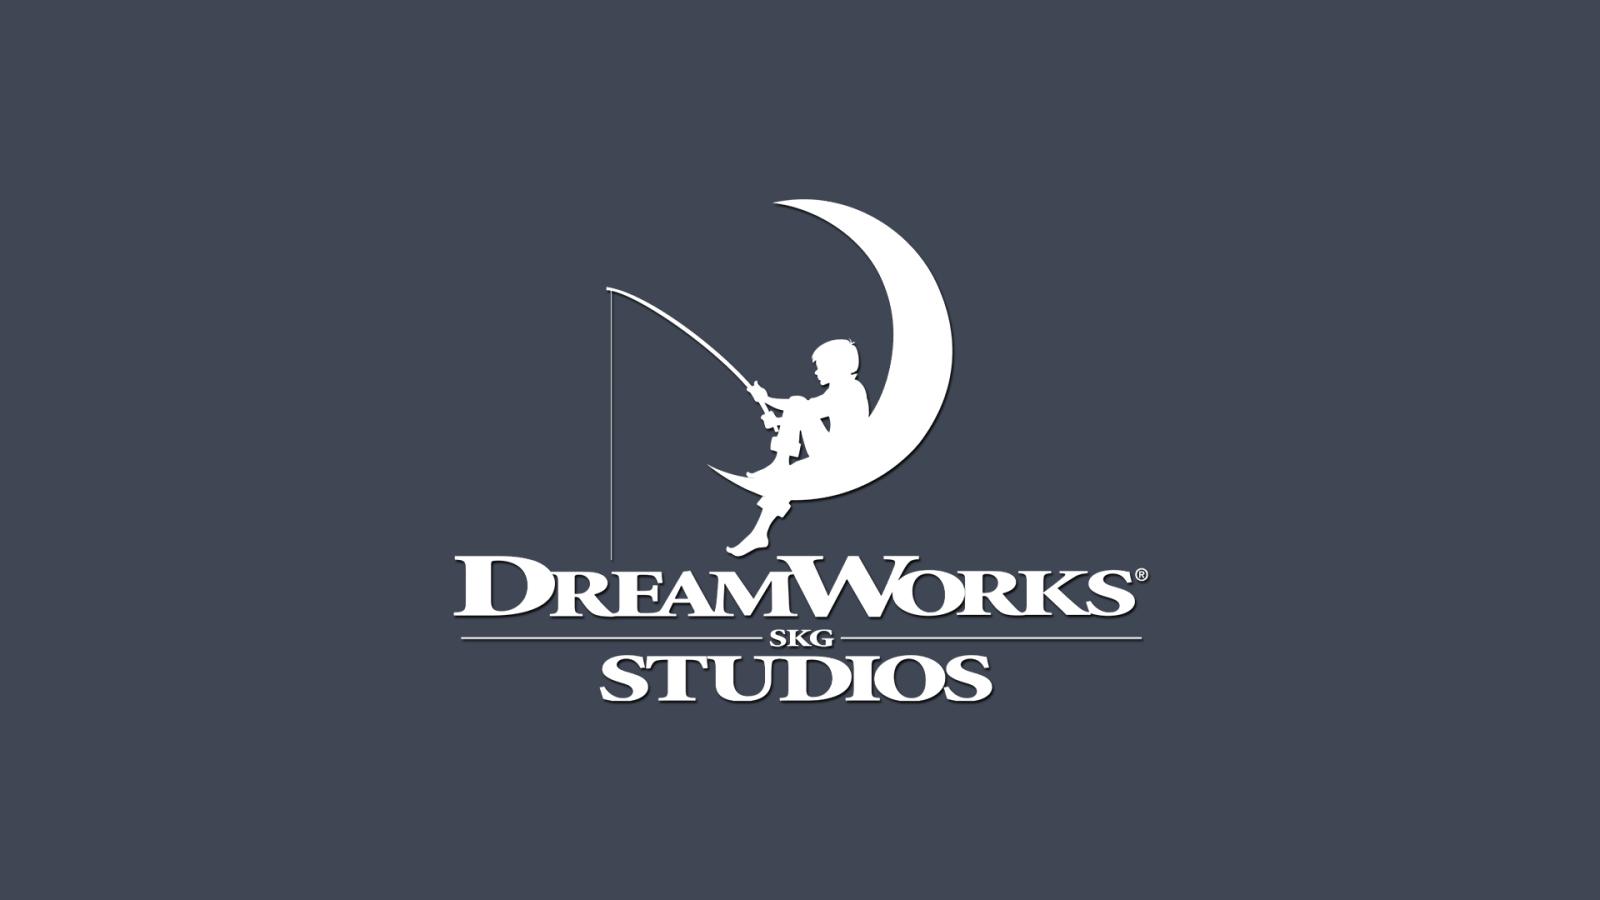 5e7a792004a8e_Dreamworks1.png